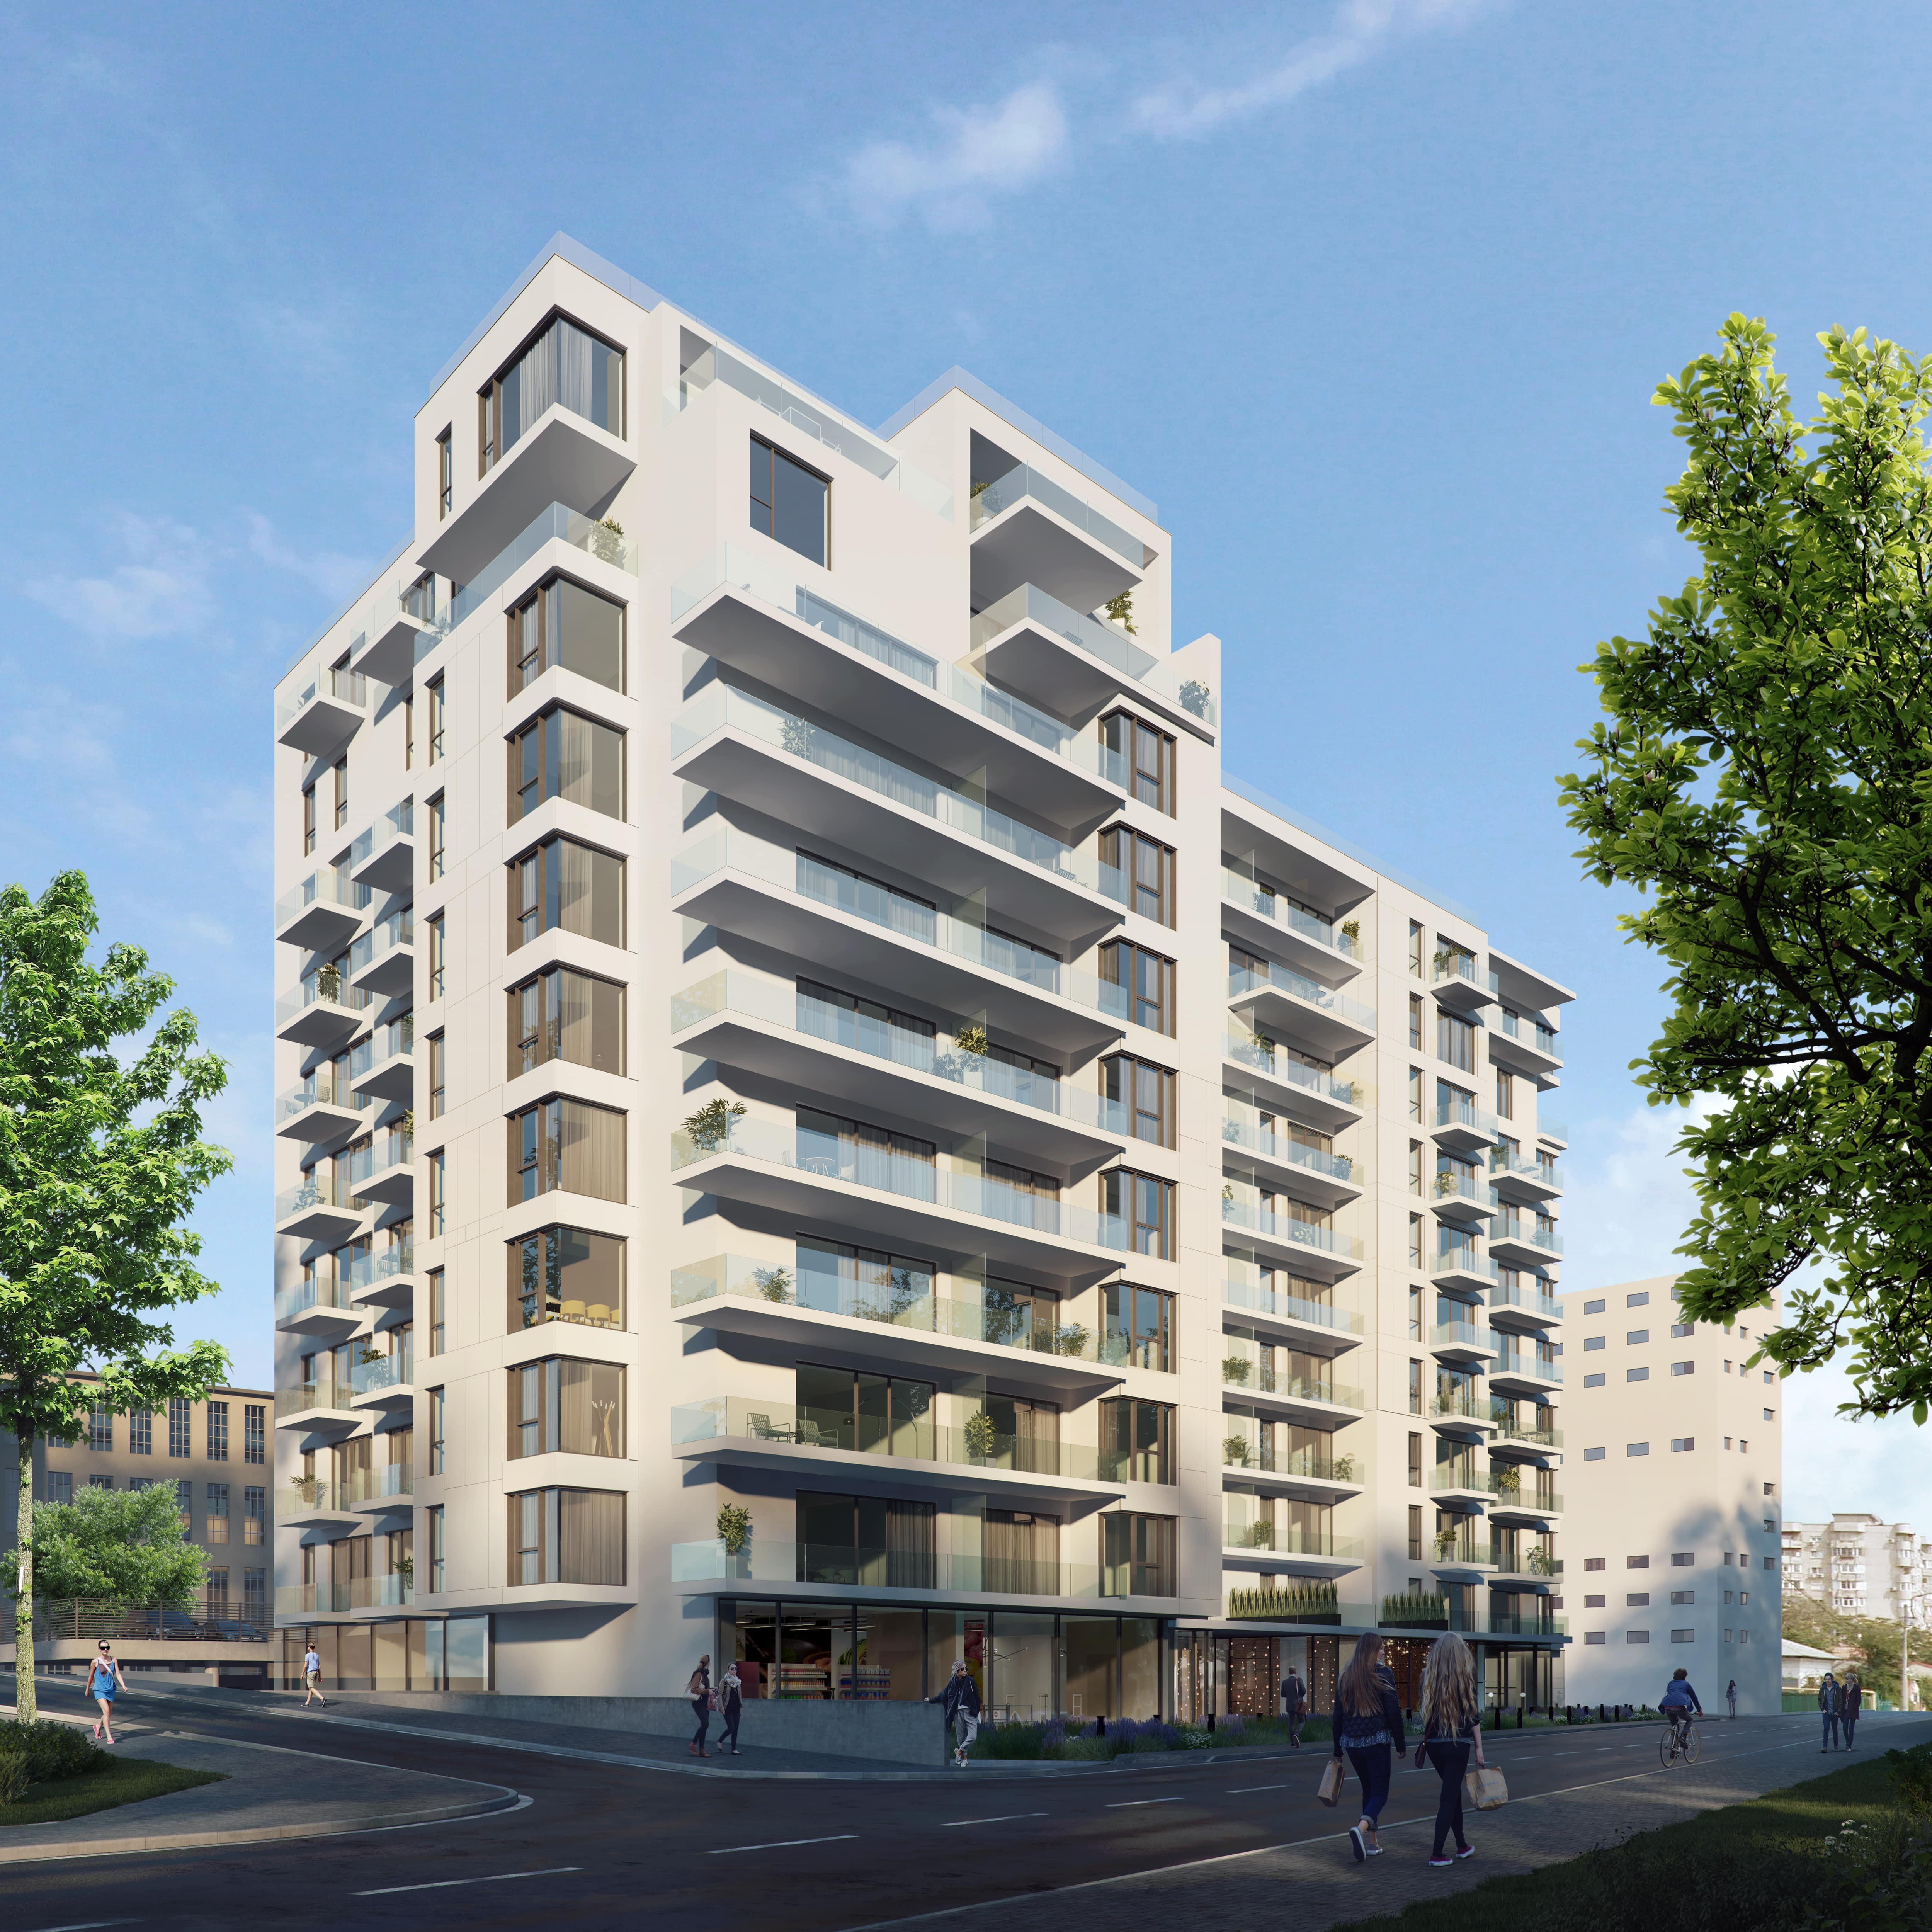 https://ahe-ro.s3.amazonaws.com/8239/penthouse-si-apartamente-unirii-%286%29.jpg